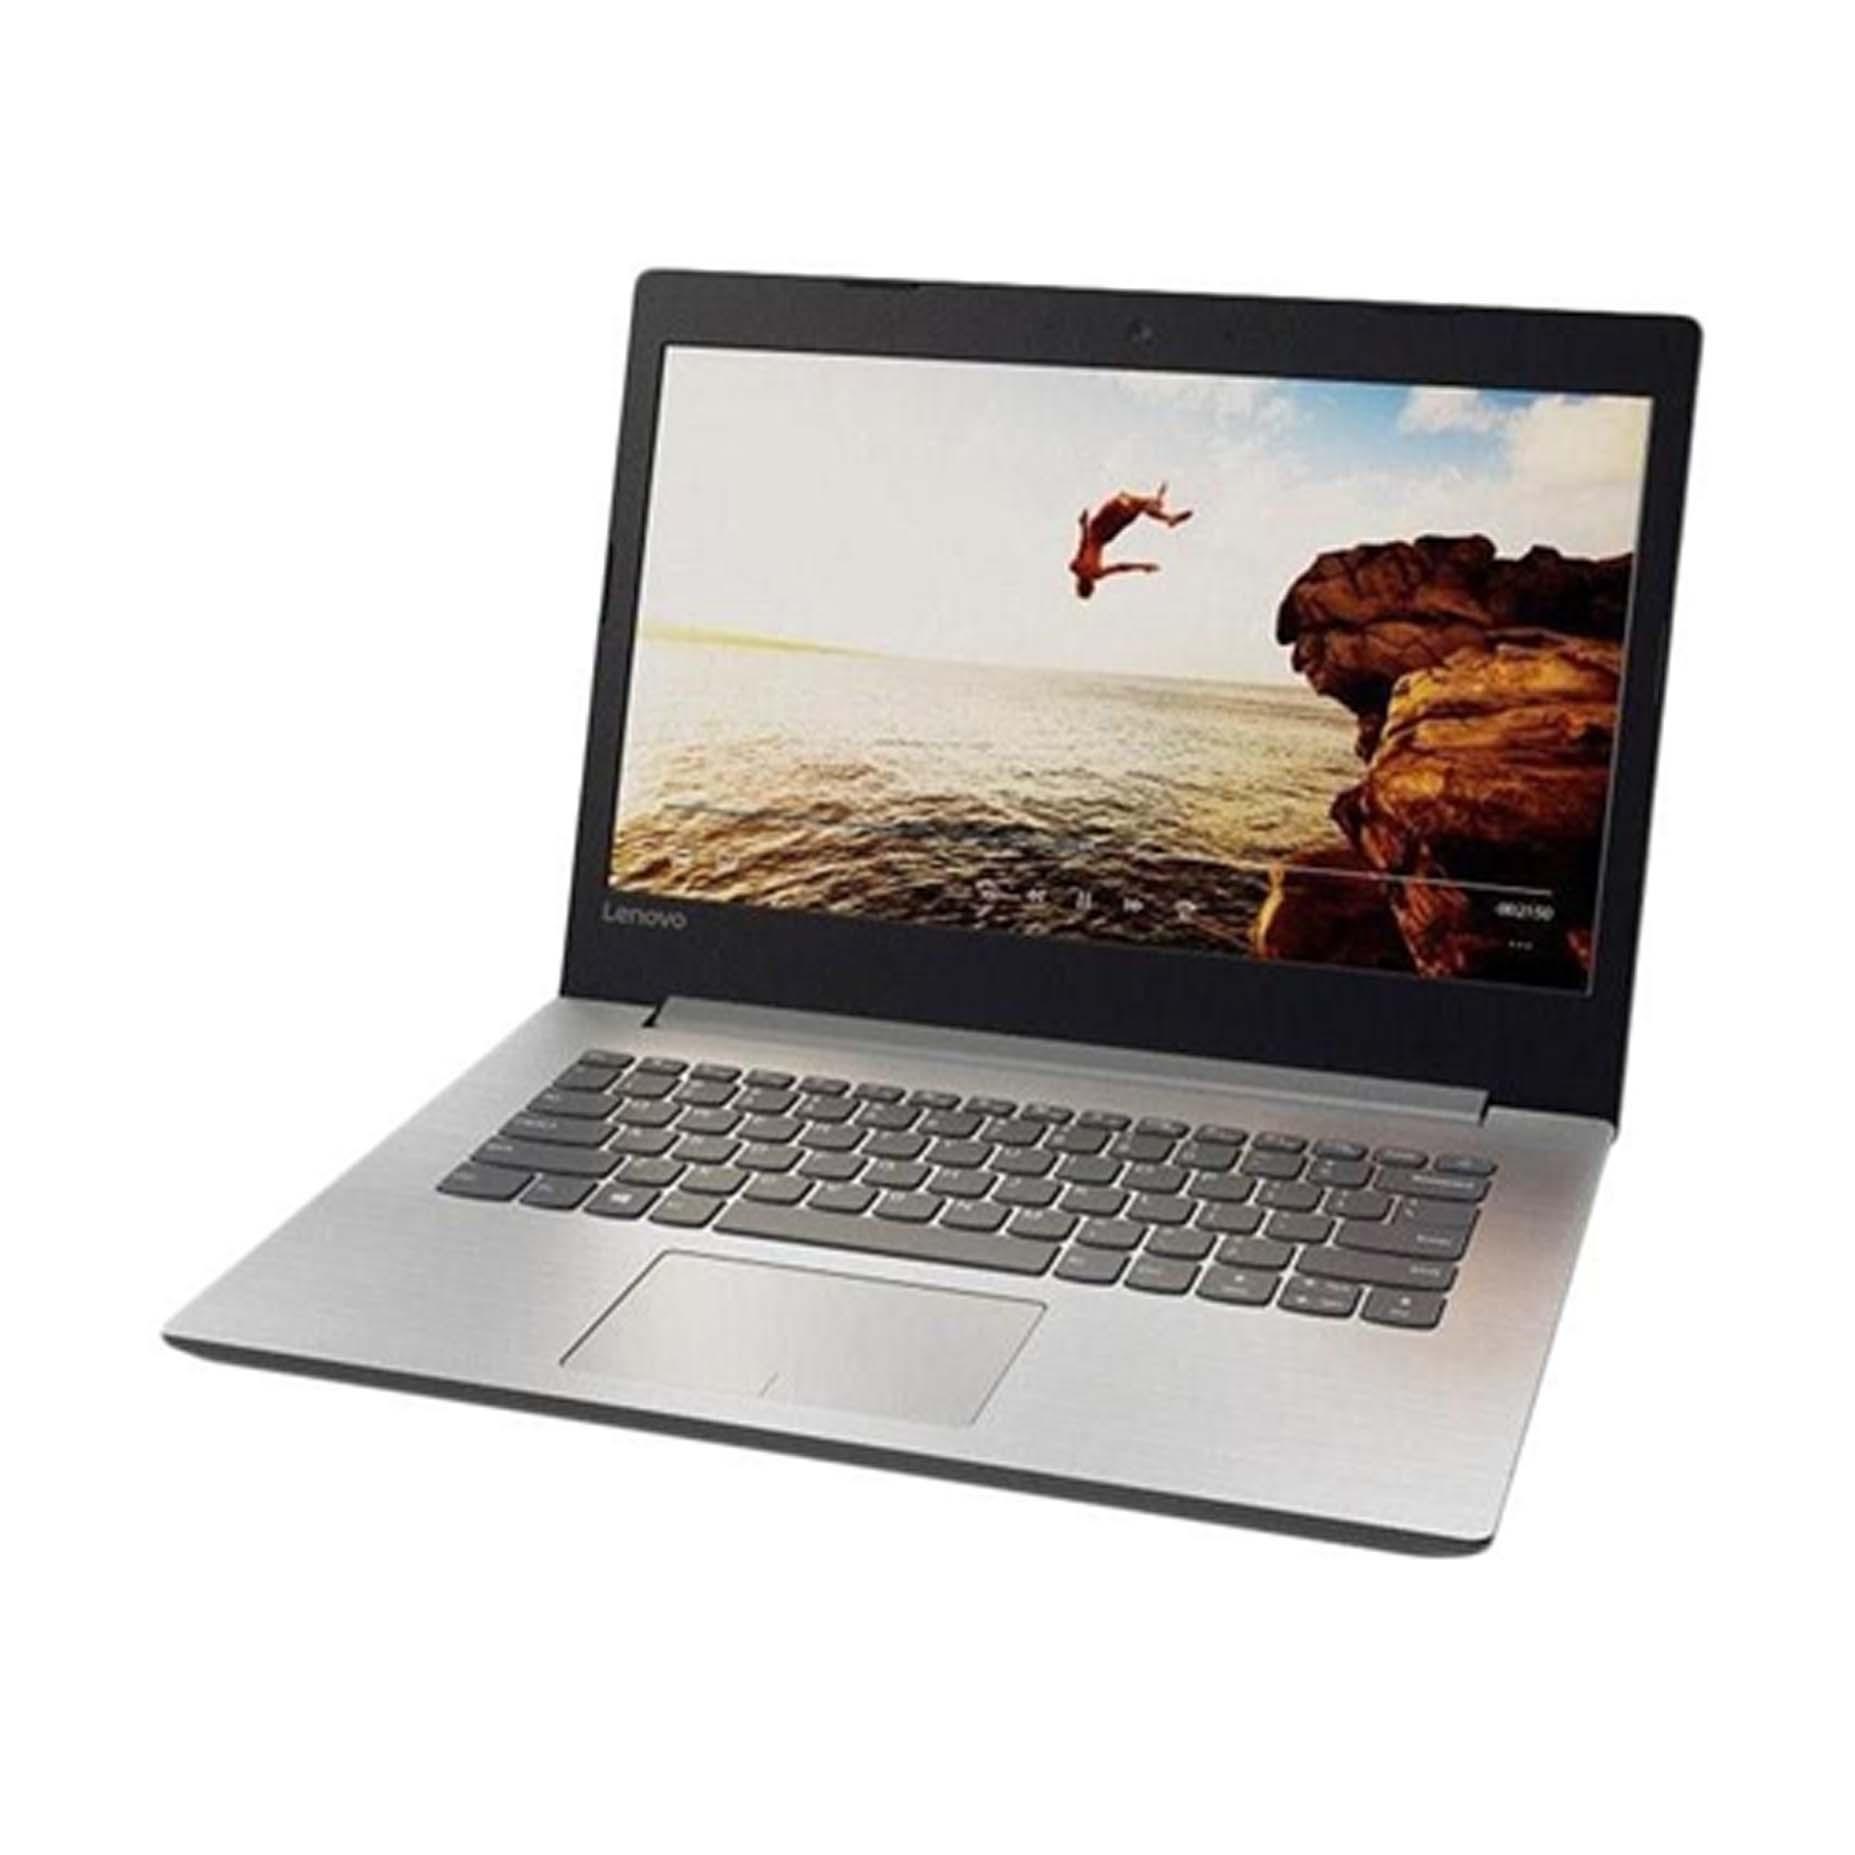 Harga Lenovo Ideapad IP320-14ISK 1FID Laptop Intel Core i3-6006U 4GB 1TB Integrated Windows 10 14 Inch Grey